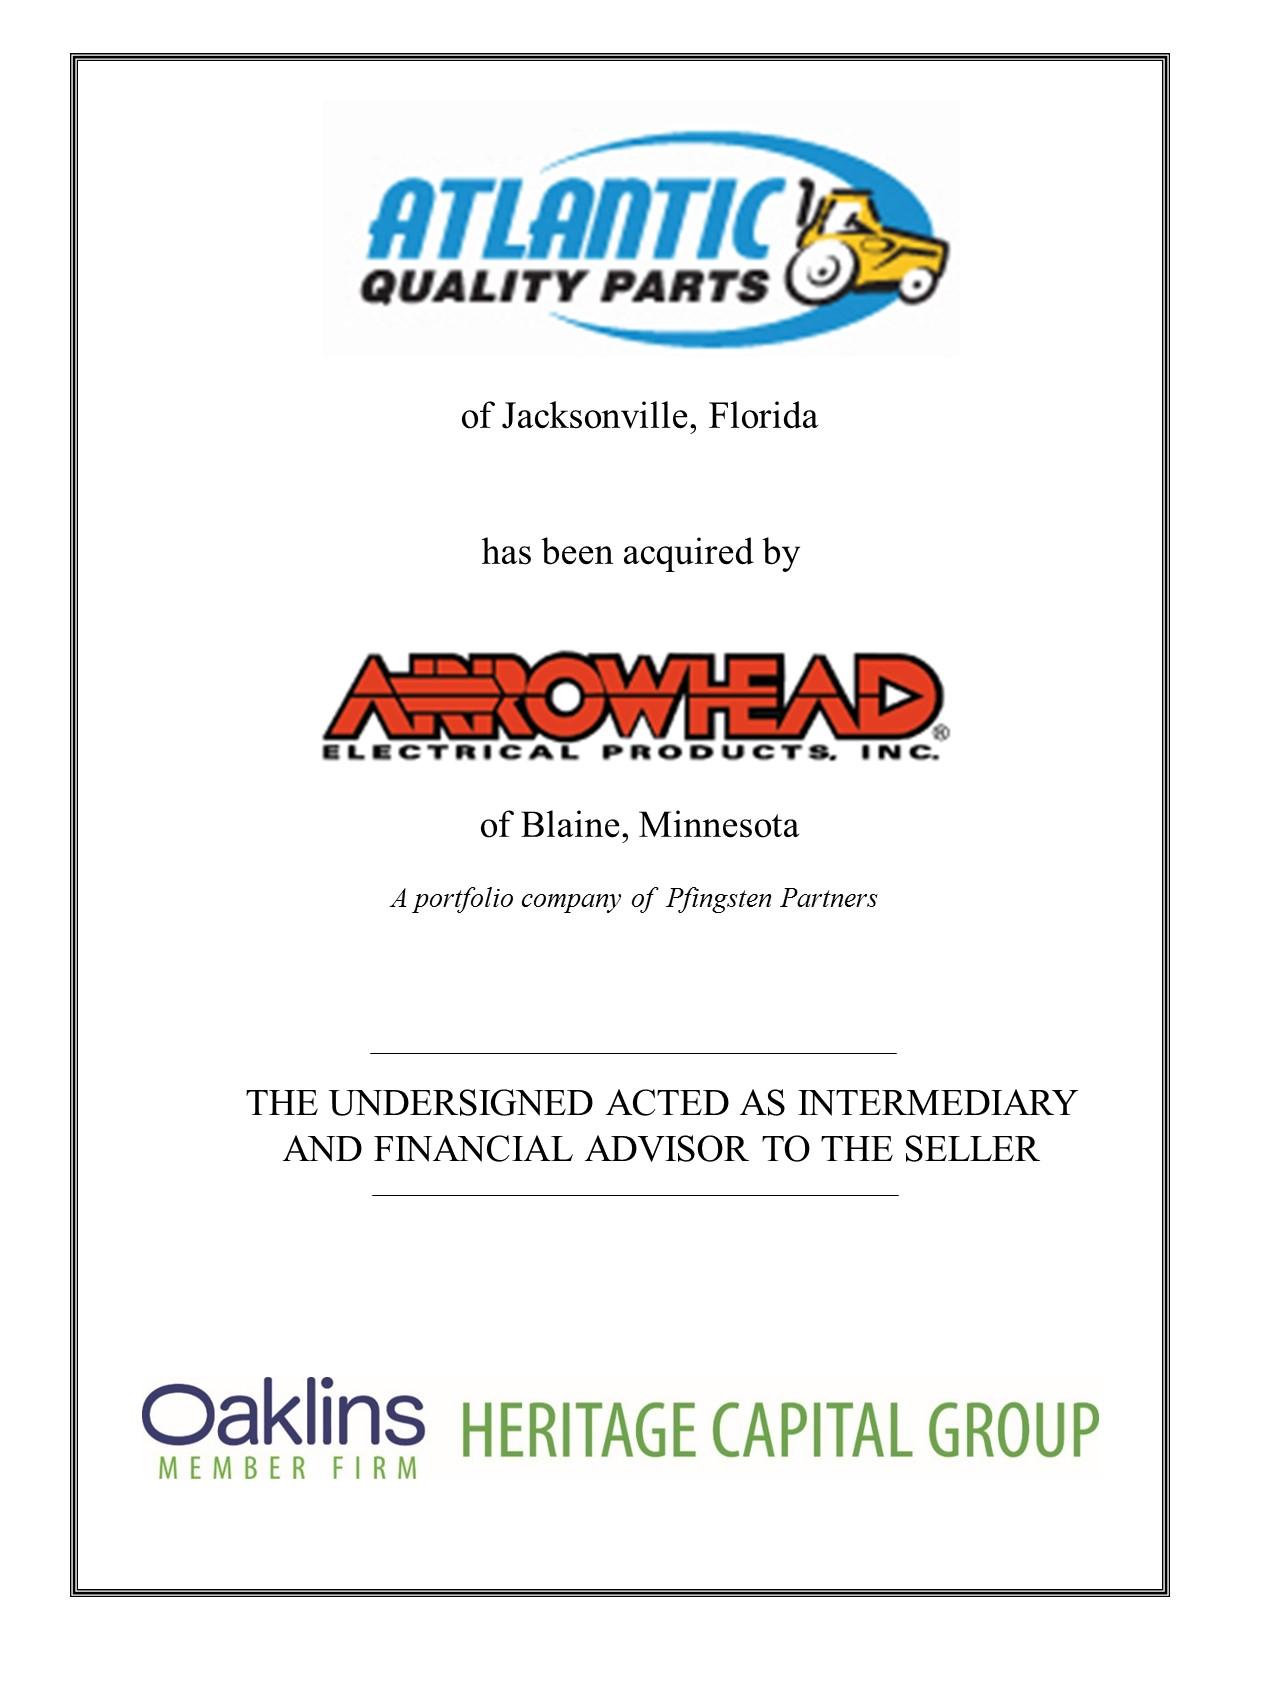 Sale of Atlantic International Distributors, Inc. | Heritage Capital ...